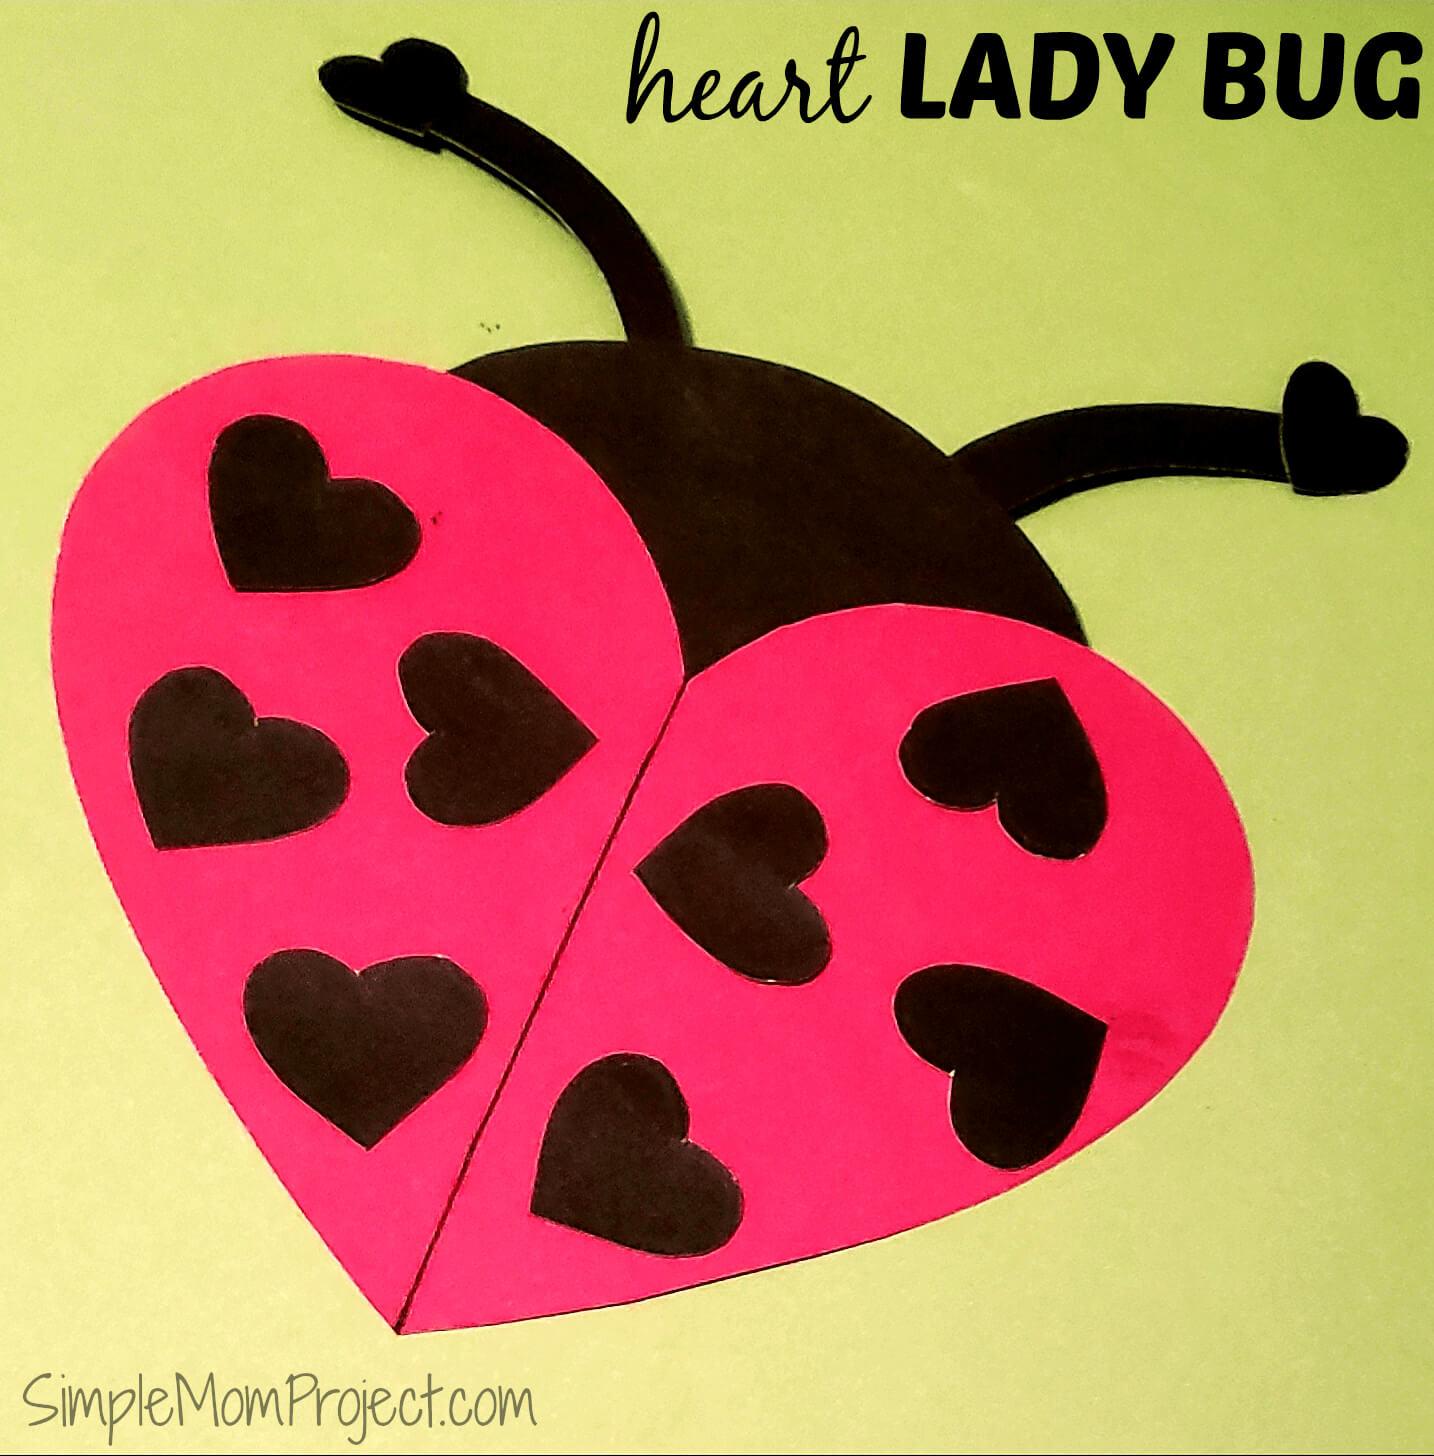 Easy Diy Valentine's Day Ladybug With Free Printable Regarding Blank Ladybug Template